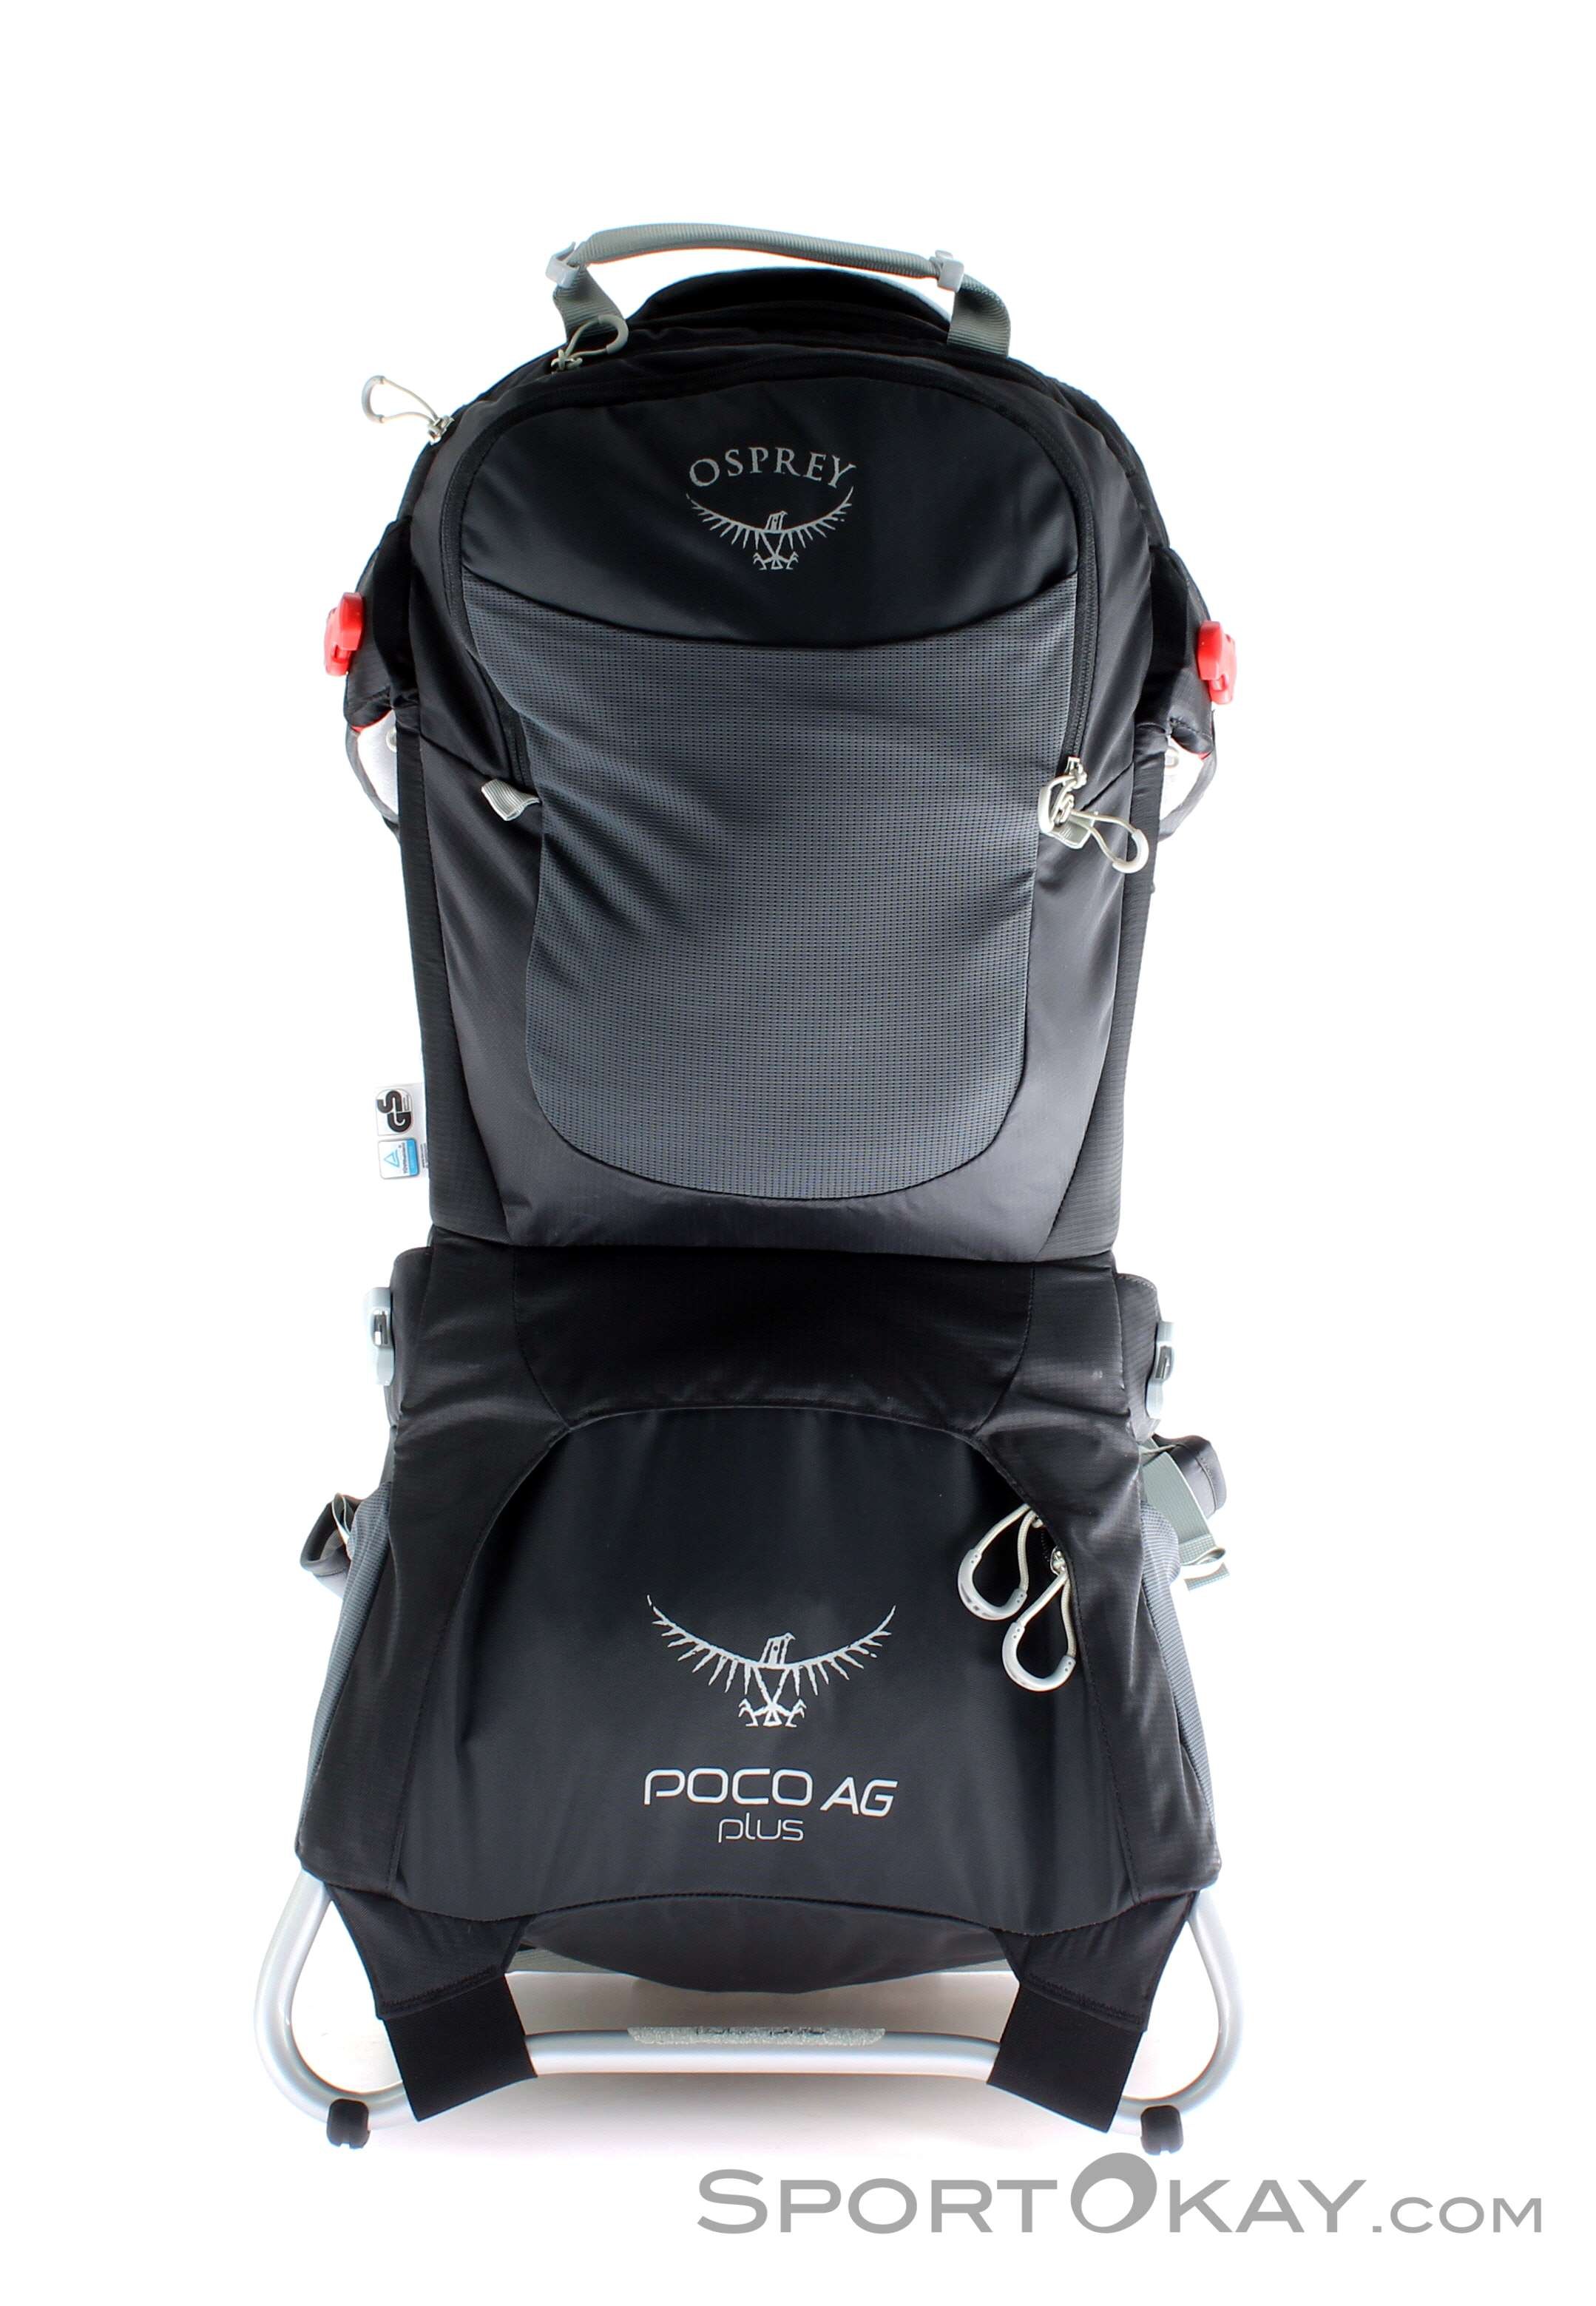 b6b07ab9a9e Osprey Poco AG Plus Child Carrier - Backpacks - Backpacks ...